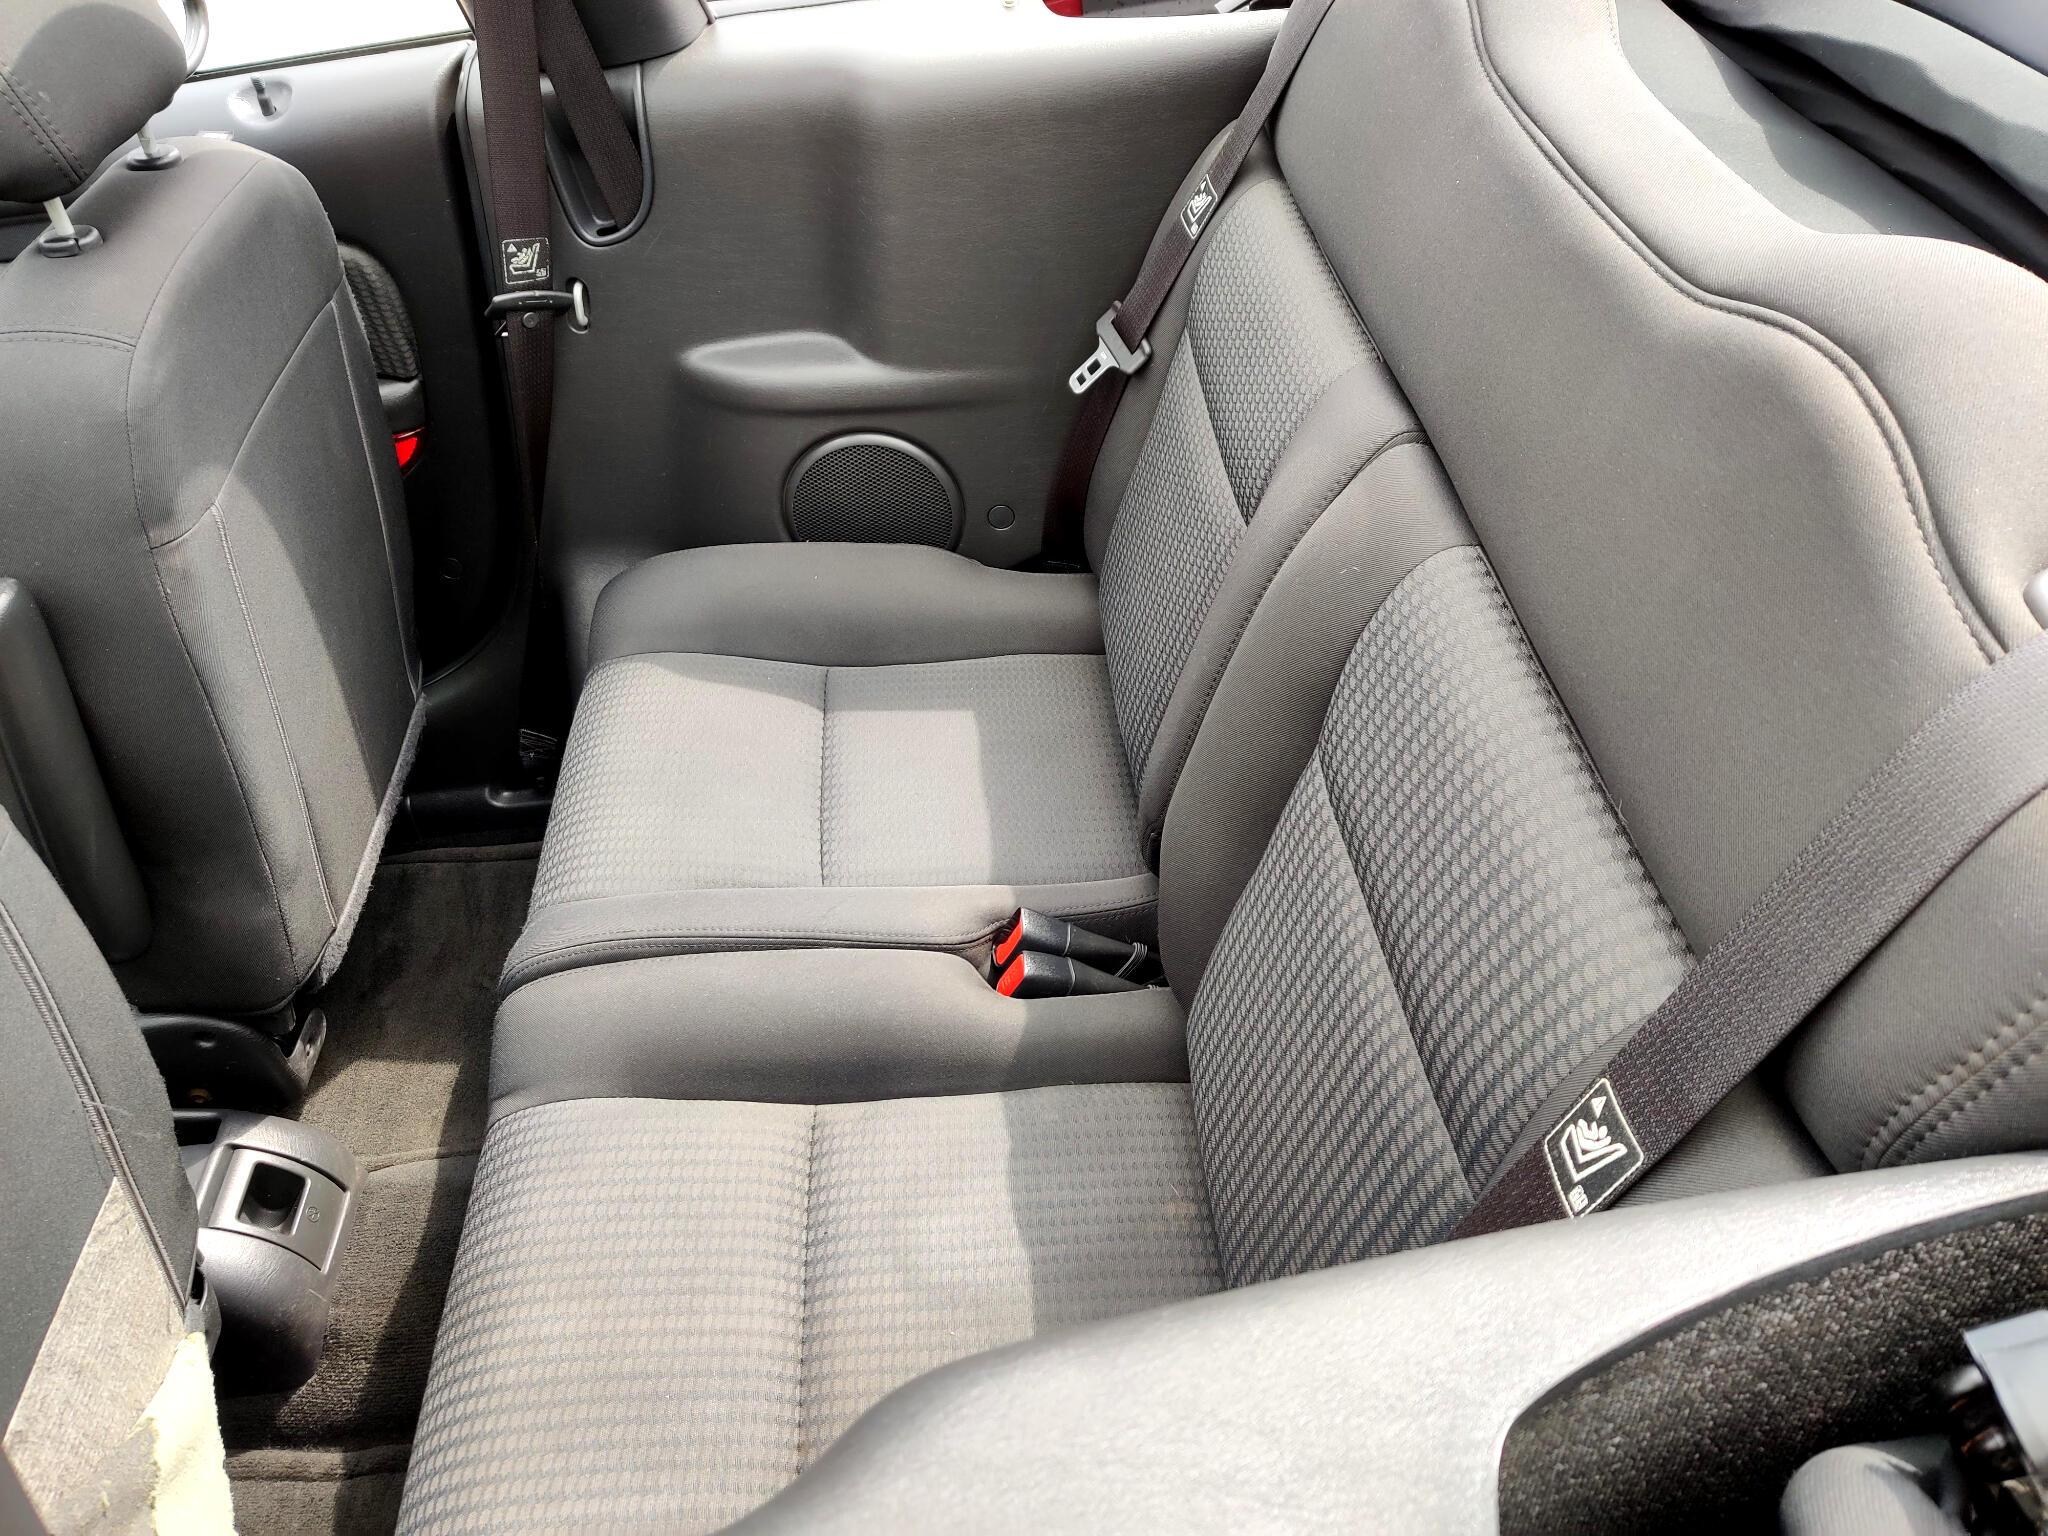 2005 Chrysler PT Cruiser 2dr Convertible Touring